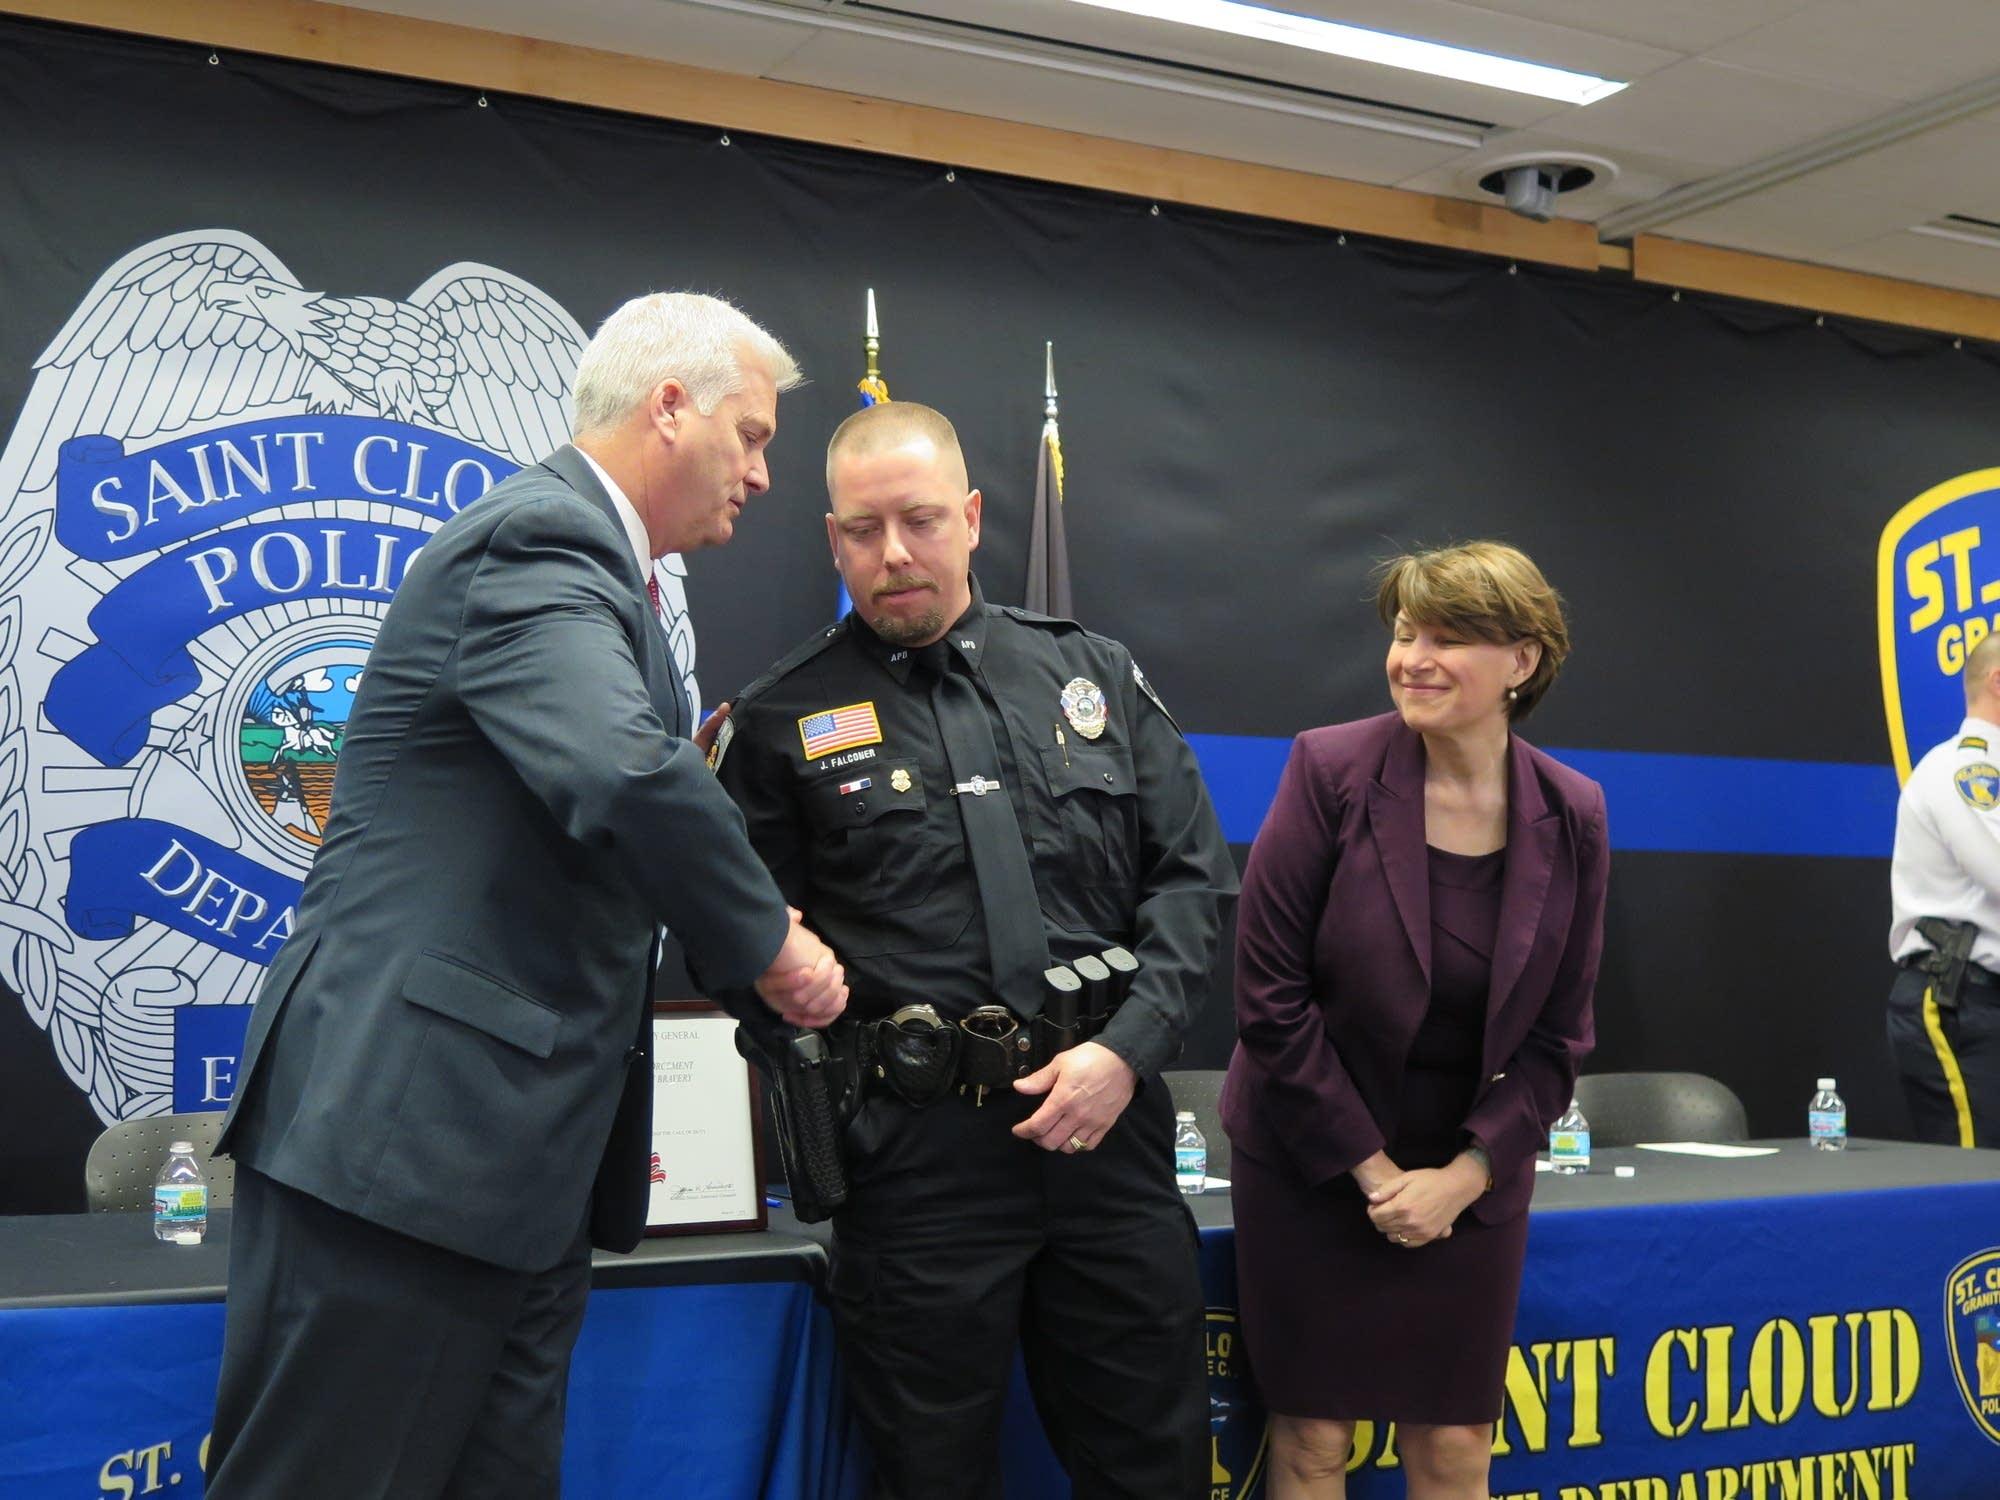 U.S. Rep. Tom Emmer and U.S. Sen. Amy Klobuchar congratulate Falconer.